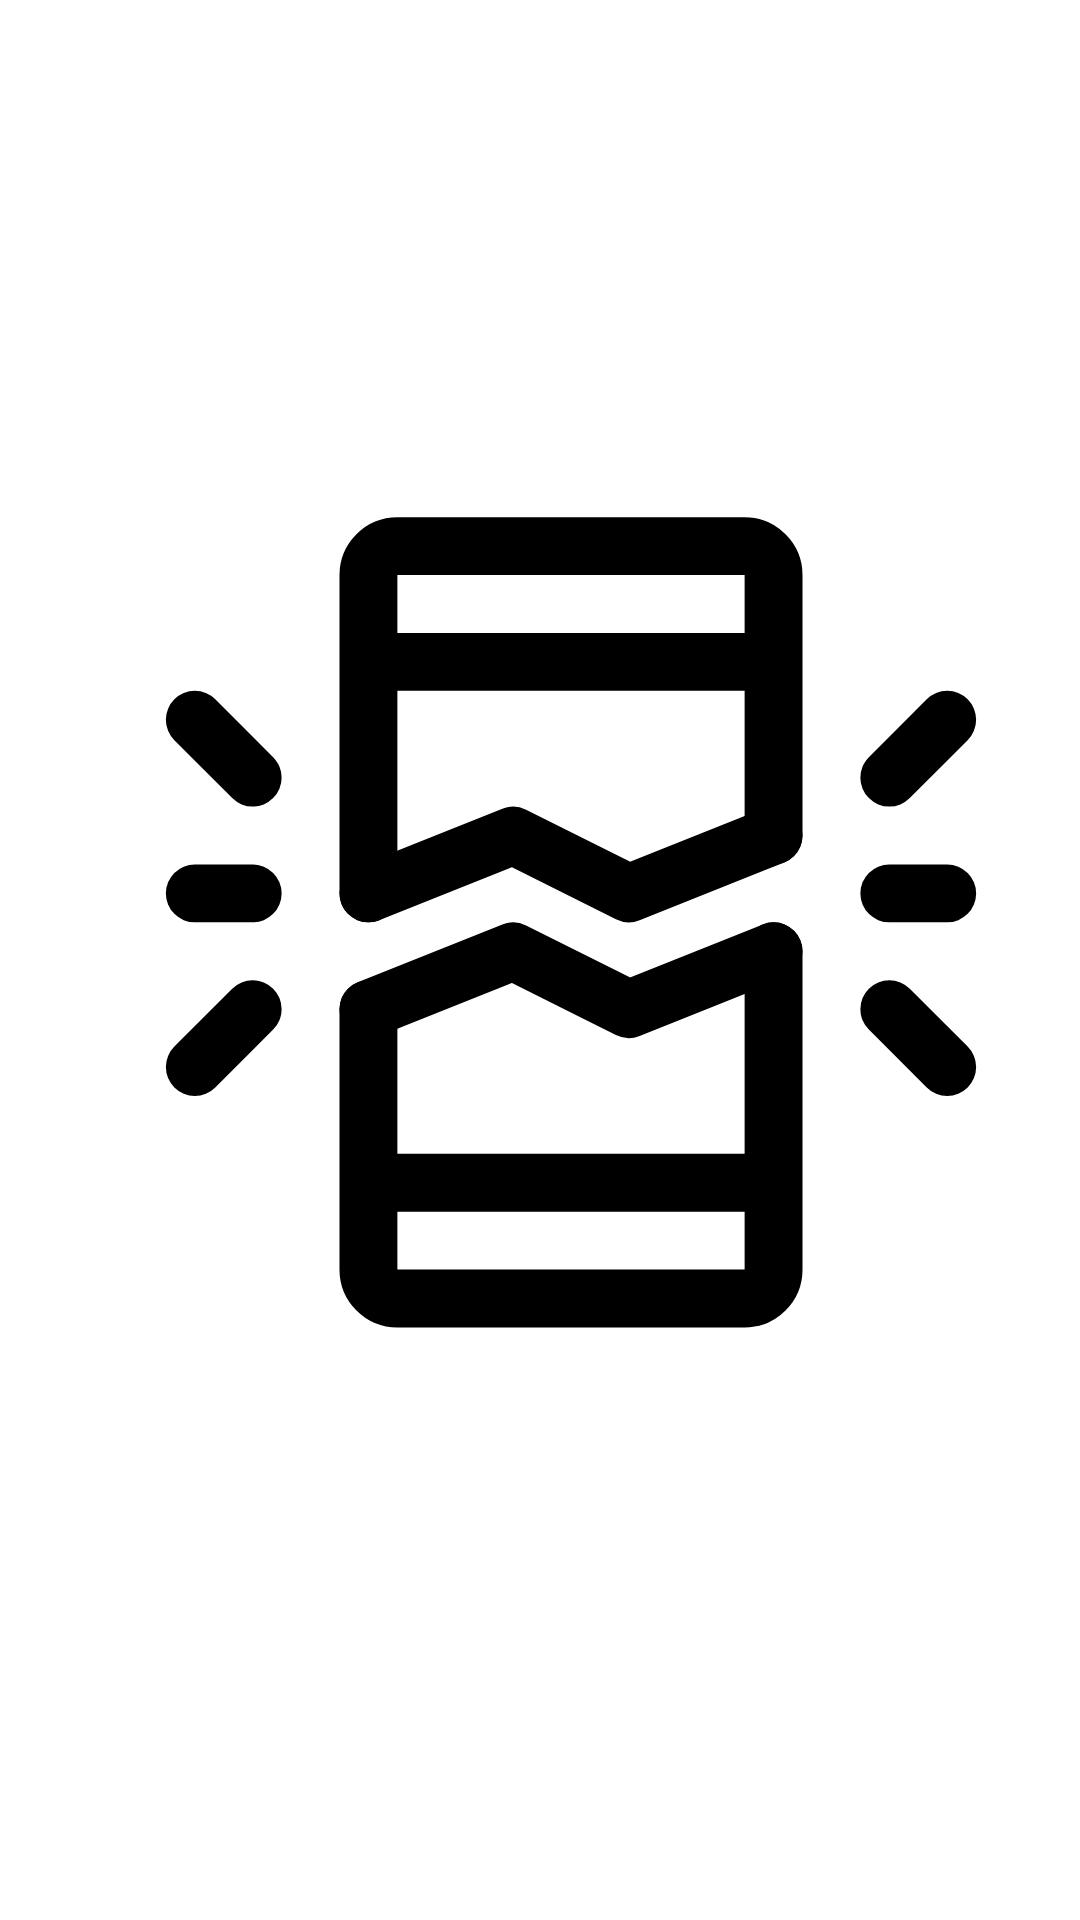 Carcasa iPhone 8 PLUS, Servicio Tecnico.